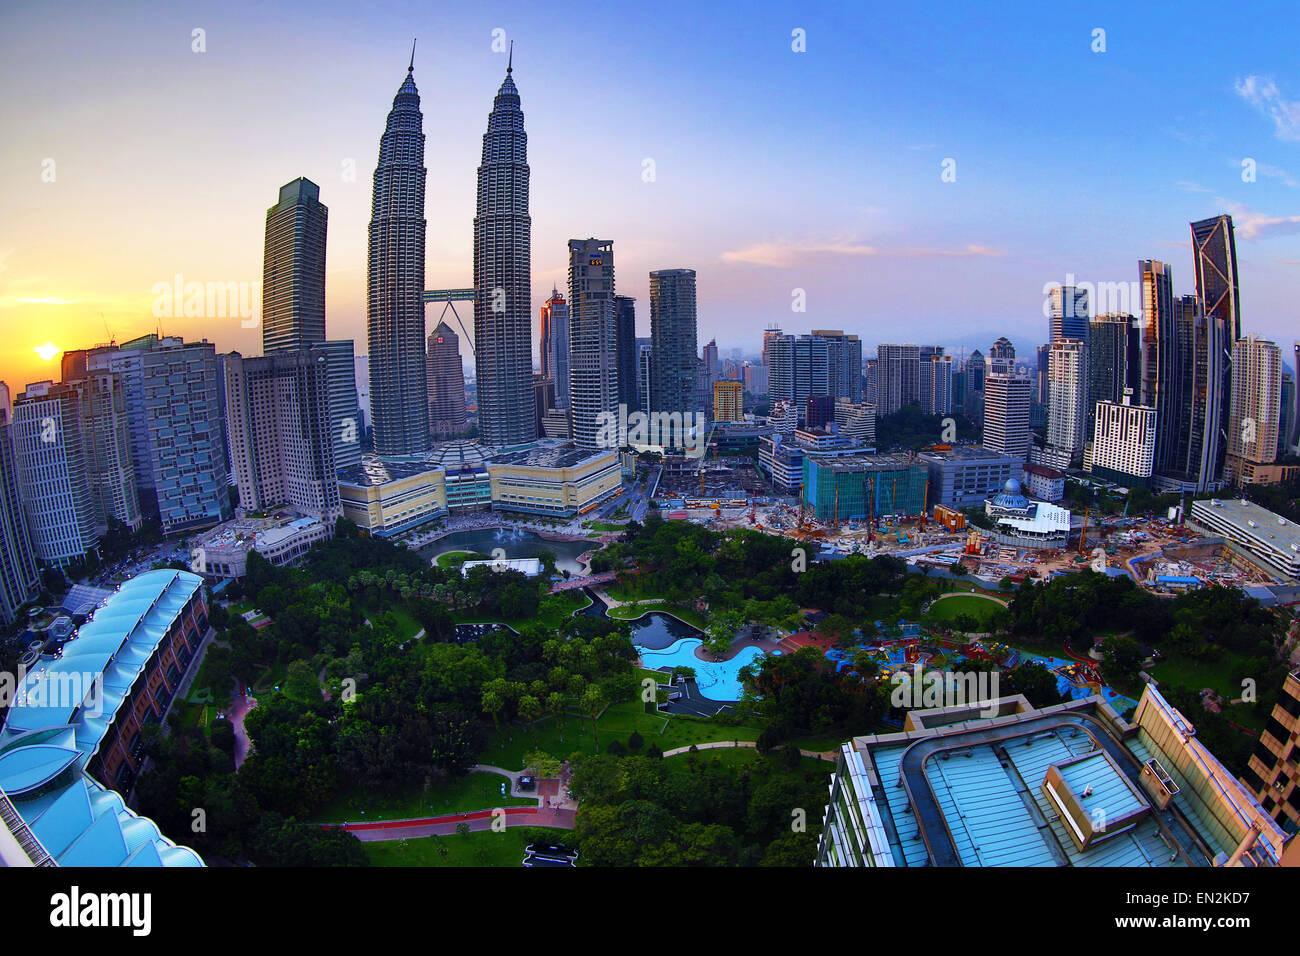 Las Torres Petronas rascacielos al atardecer, KLCC, Kuala Lumpur, Malasia Imagen De Stock